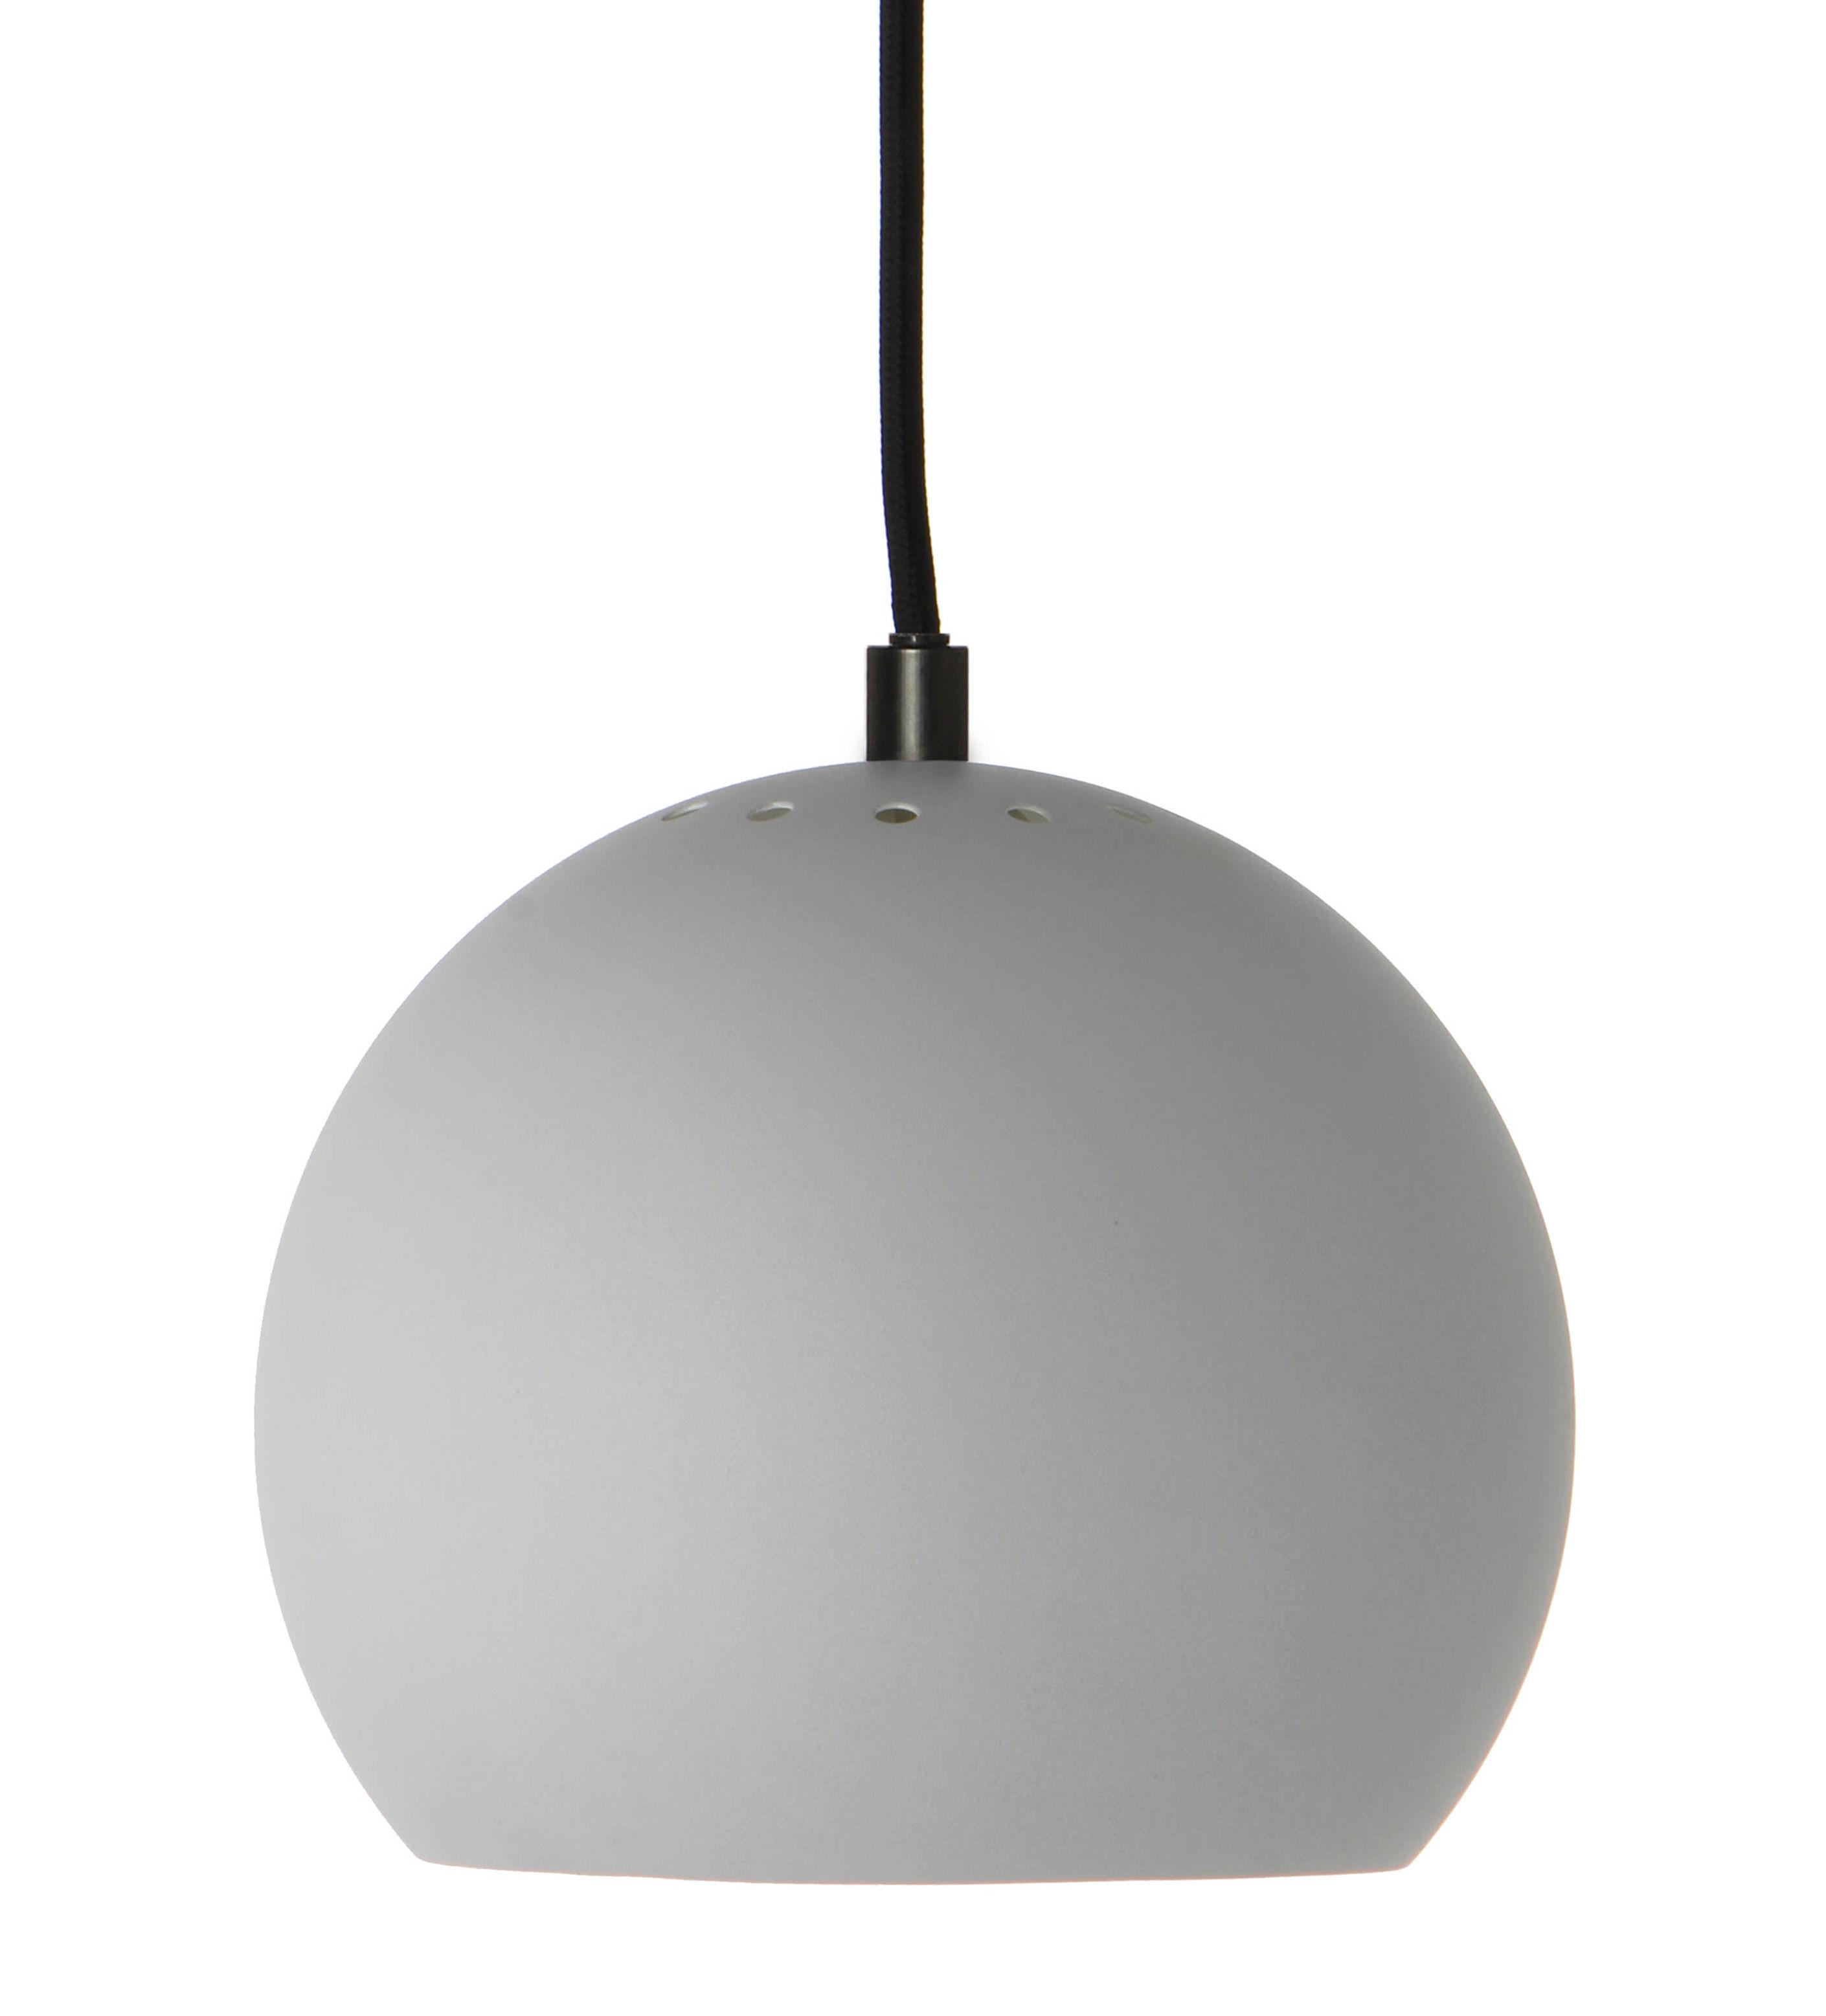 Luminaire - Suspensions - Suspension Ball Small / Ø 18 cm - Réédition 1968 - Frandsen - Gris clair mat - Métal verni